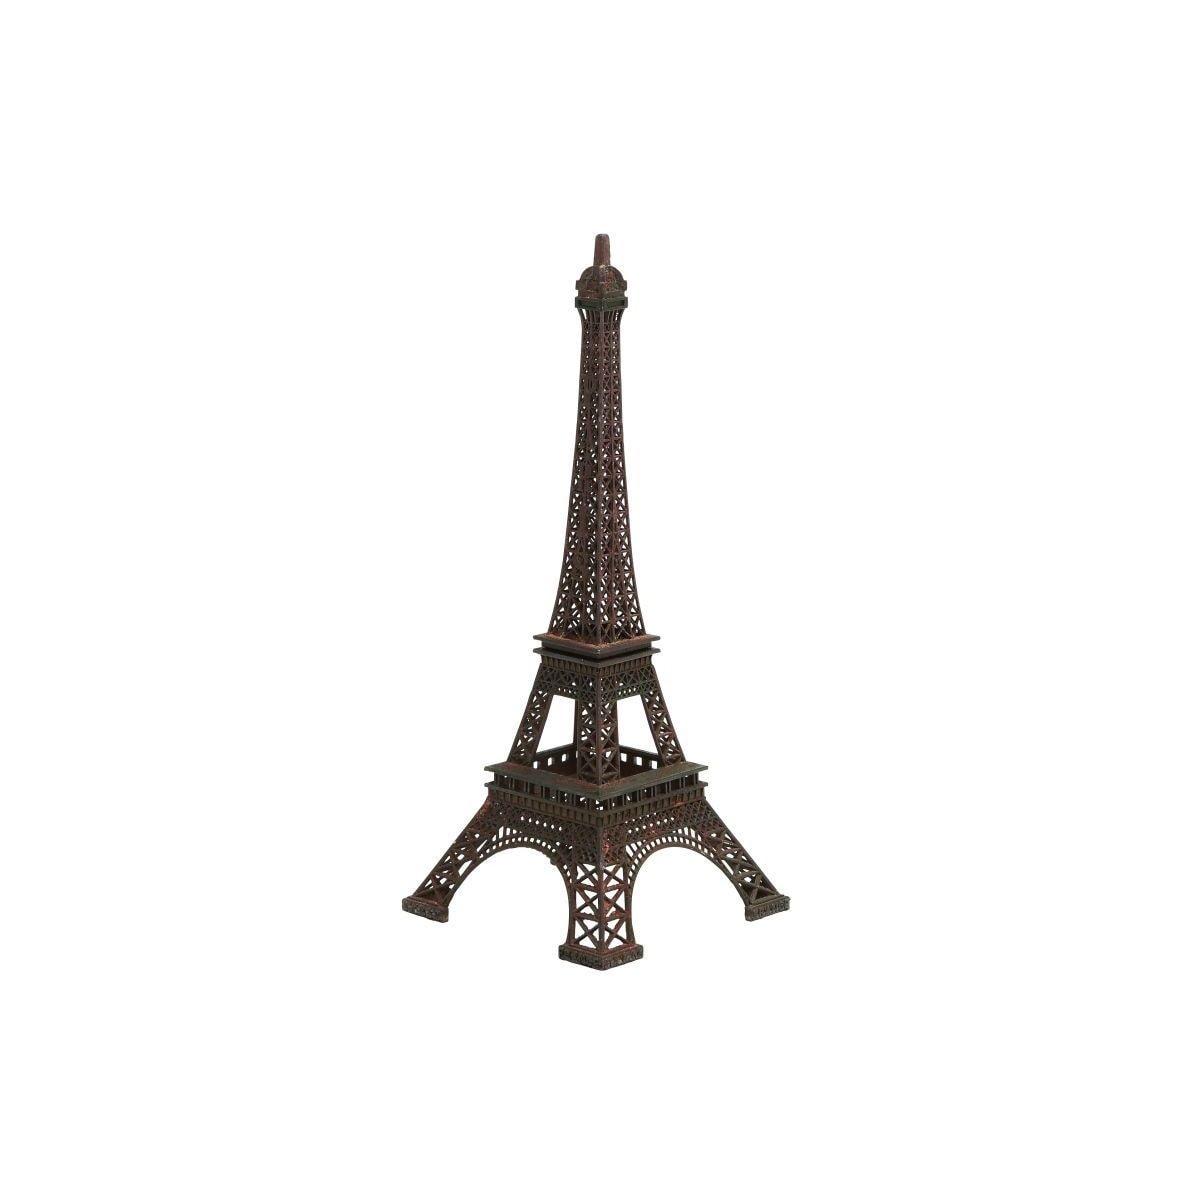 Metal 15-inch Eiffel Tower Replica